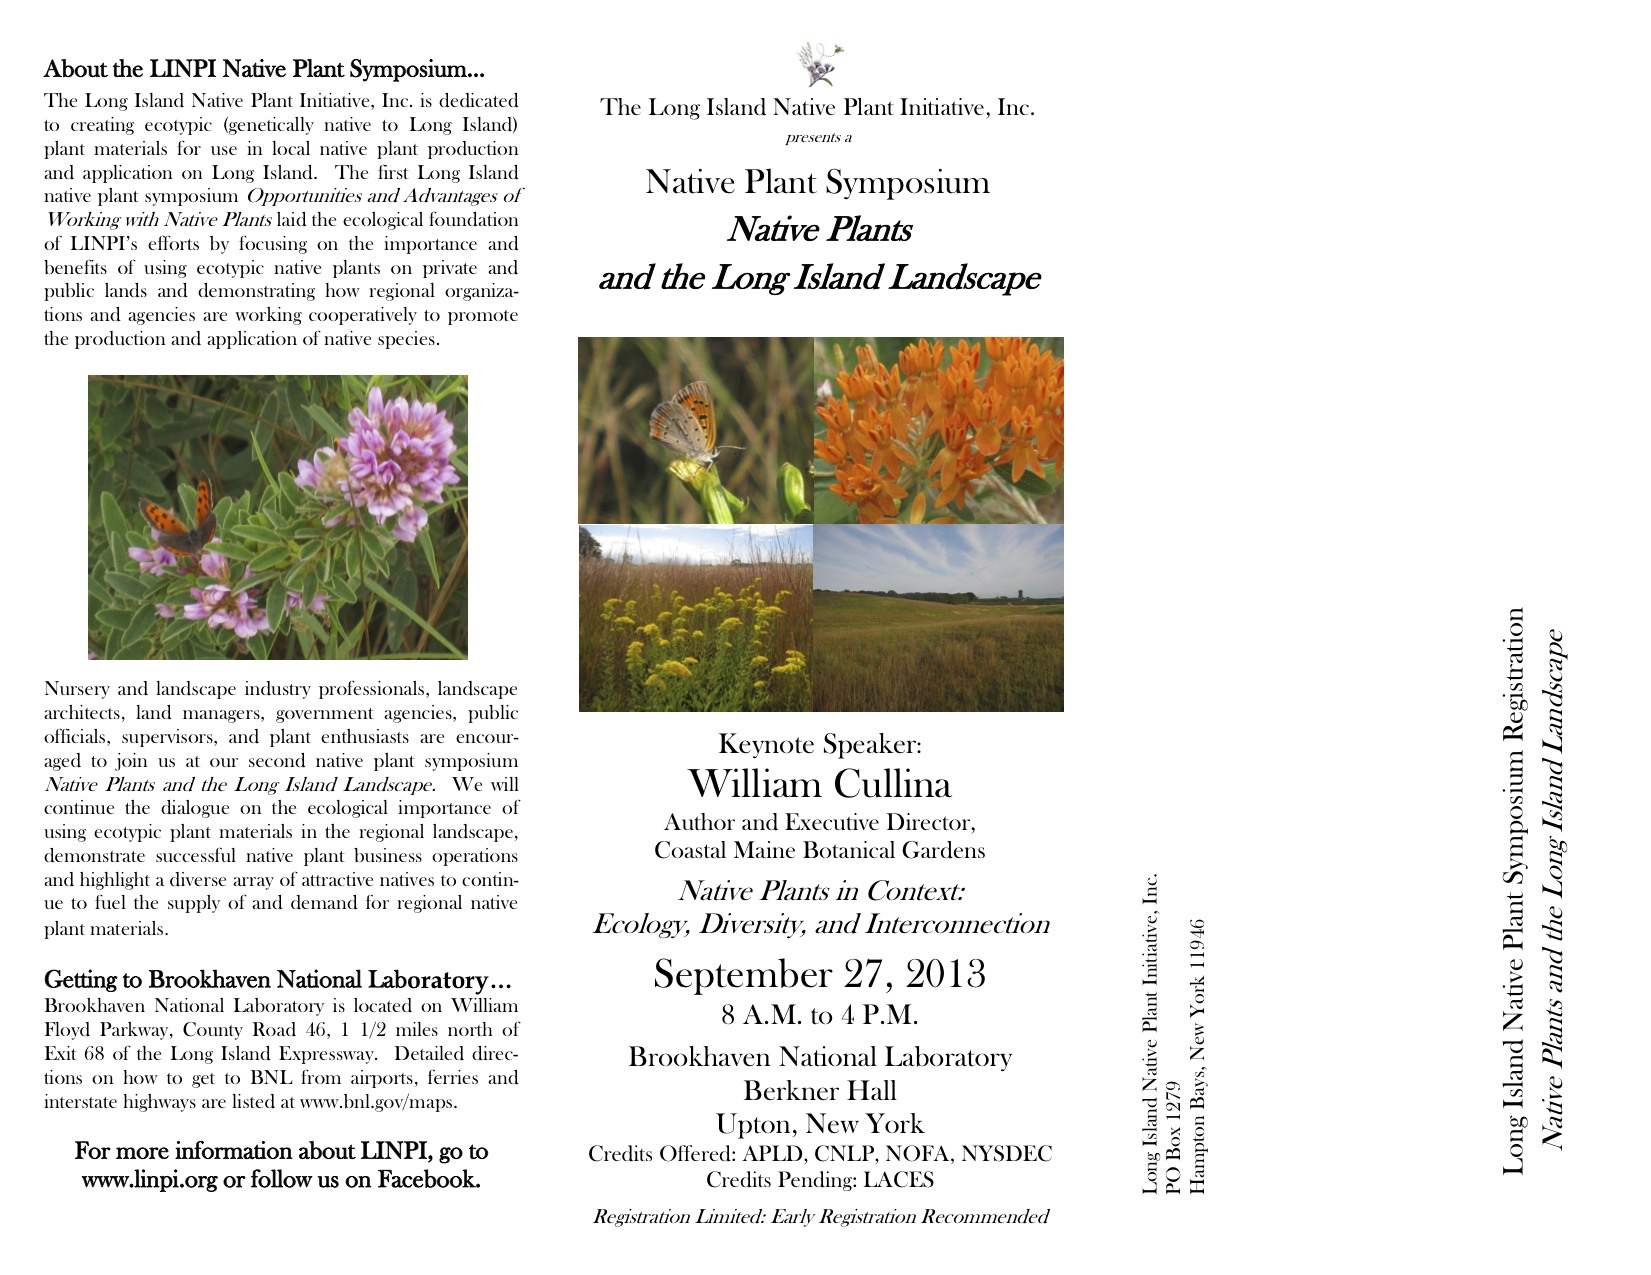 Linpi Native Plant Symposium Native Plants And The Long Island